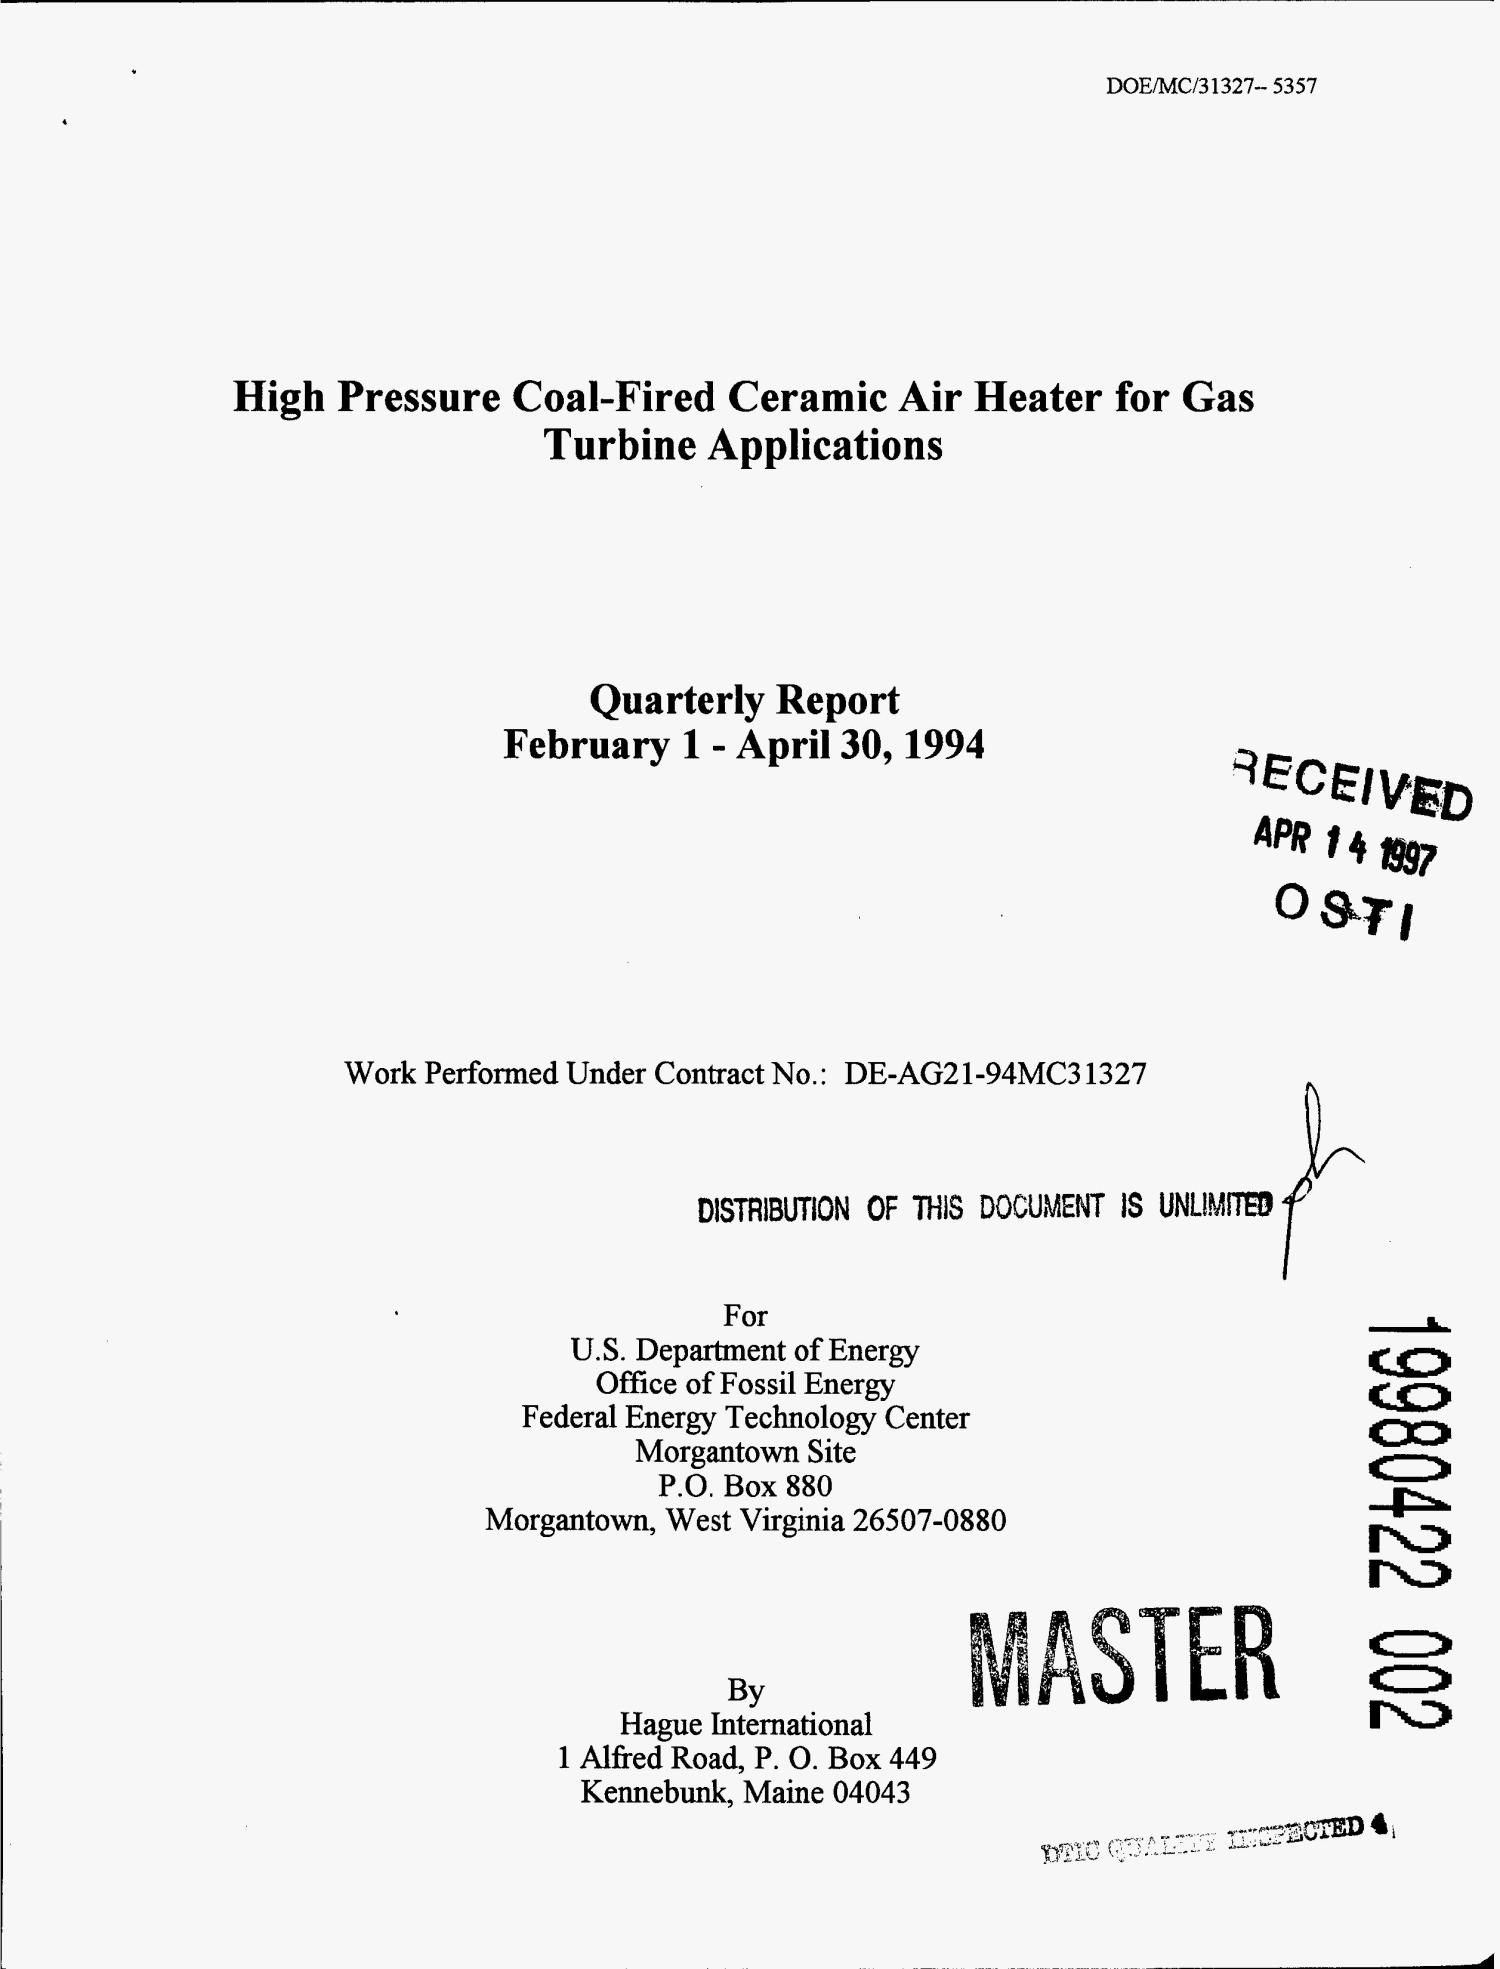 High pressure coal fired ceramic air heater for gas turbine